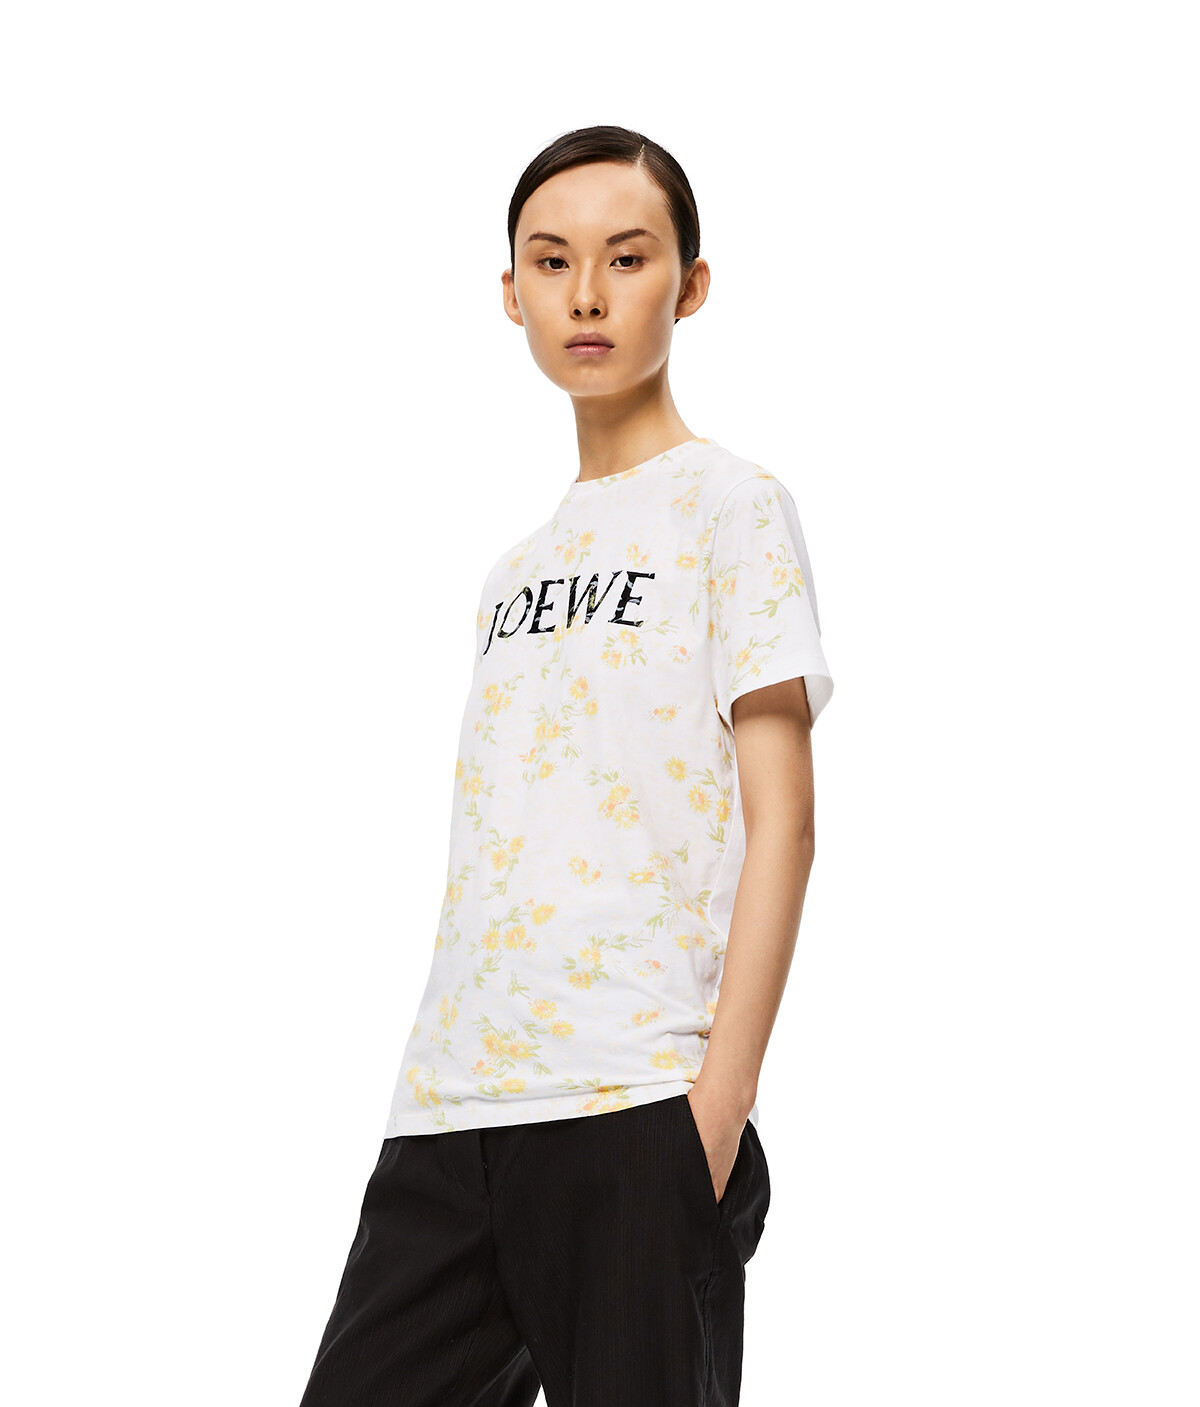 LOEWE Flower Print Loewe T-Shirt Blanco/Amarillo front